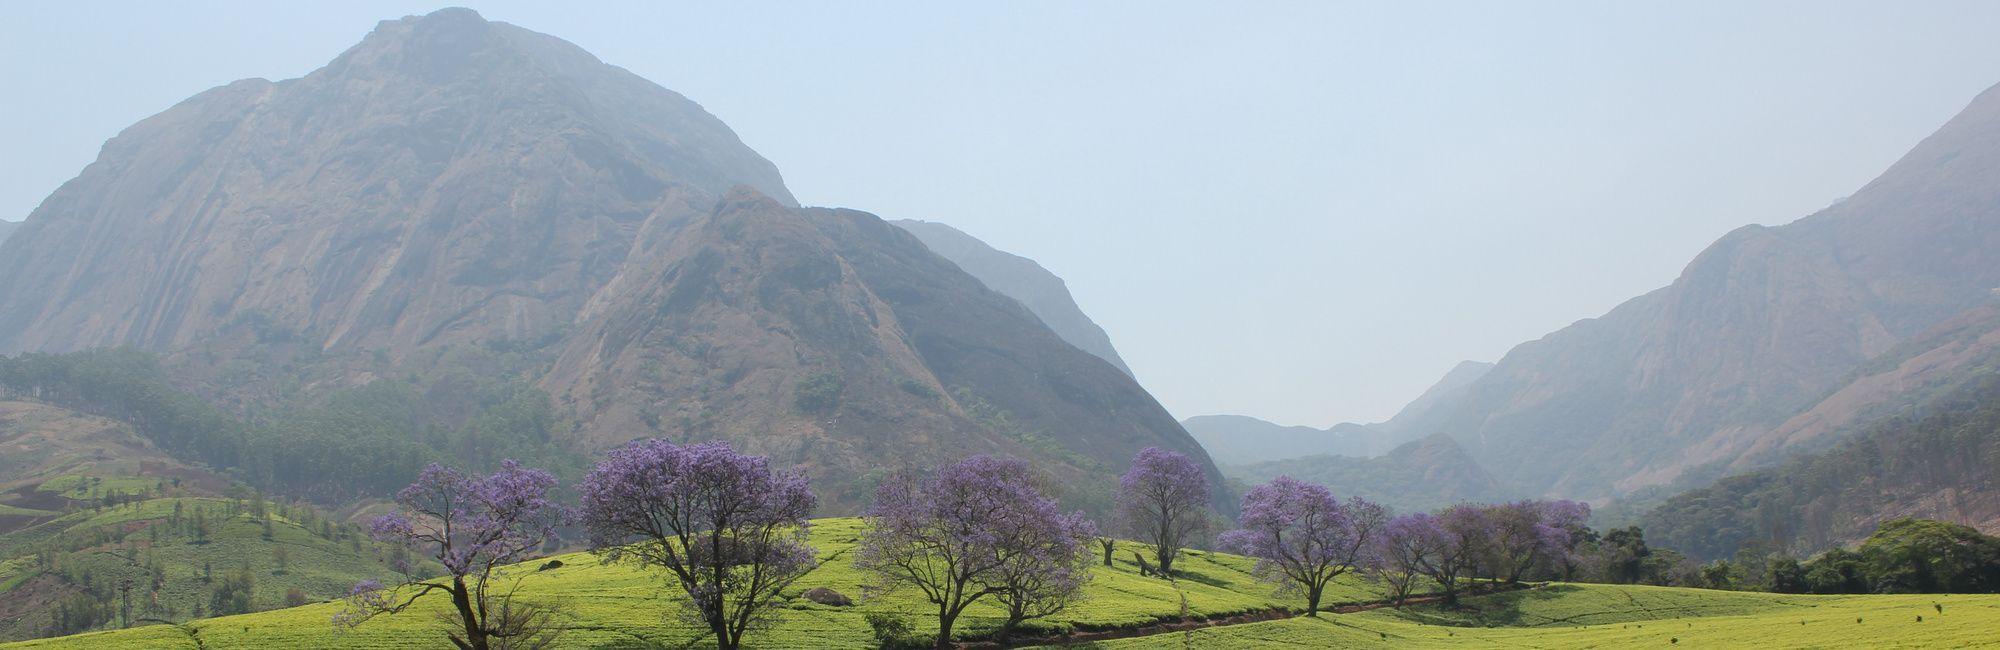 Mount Mulanje